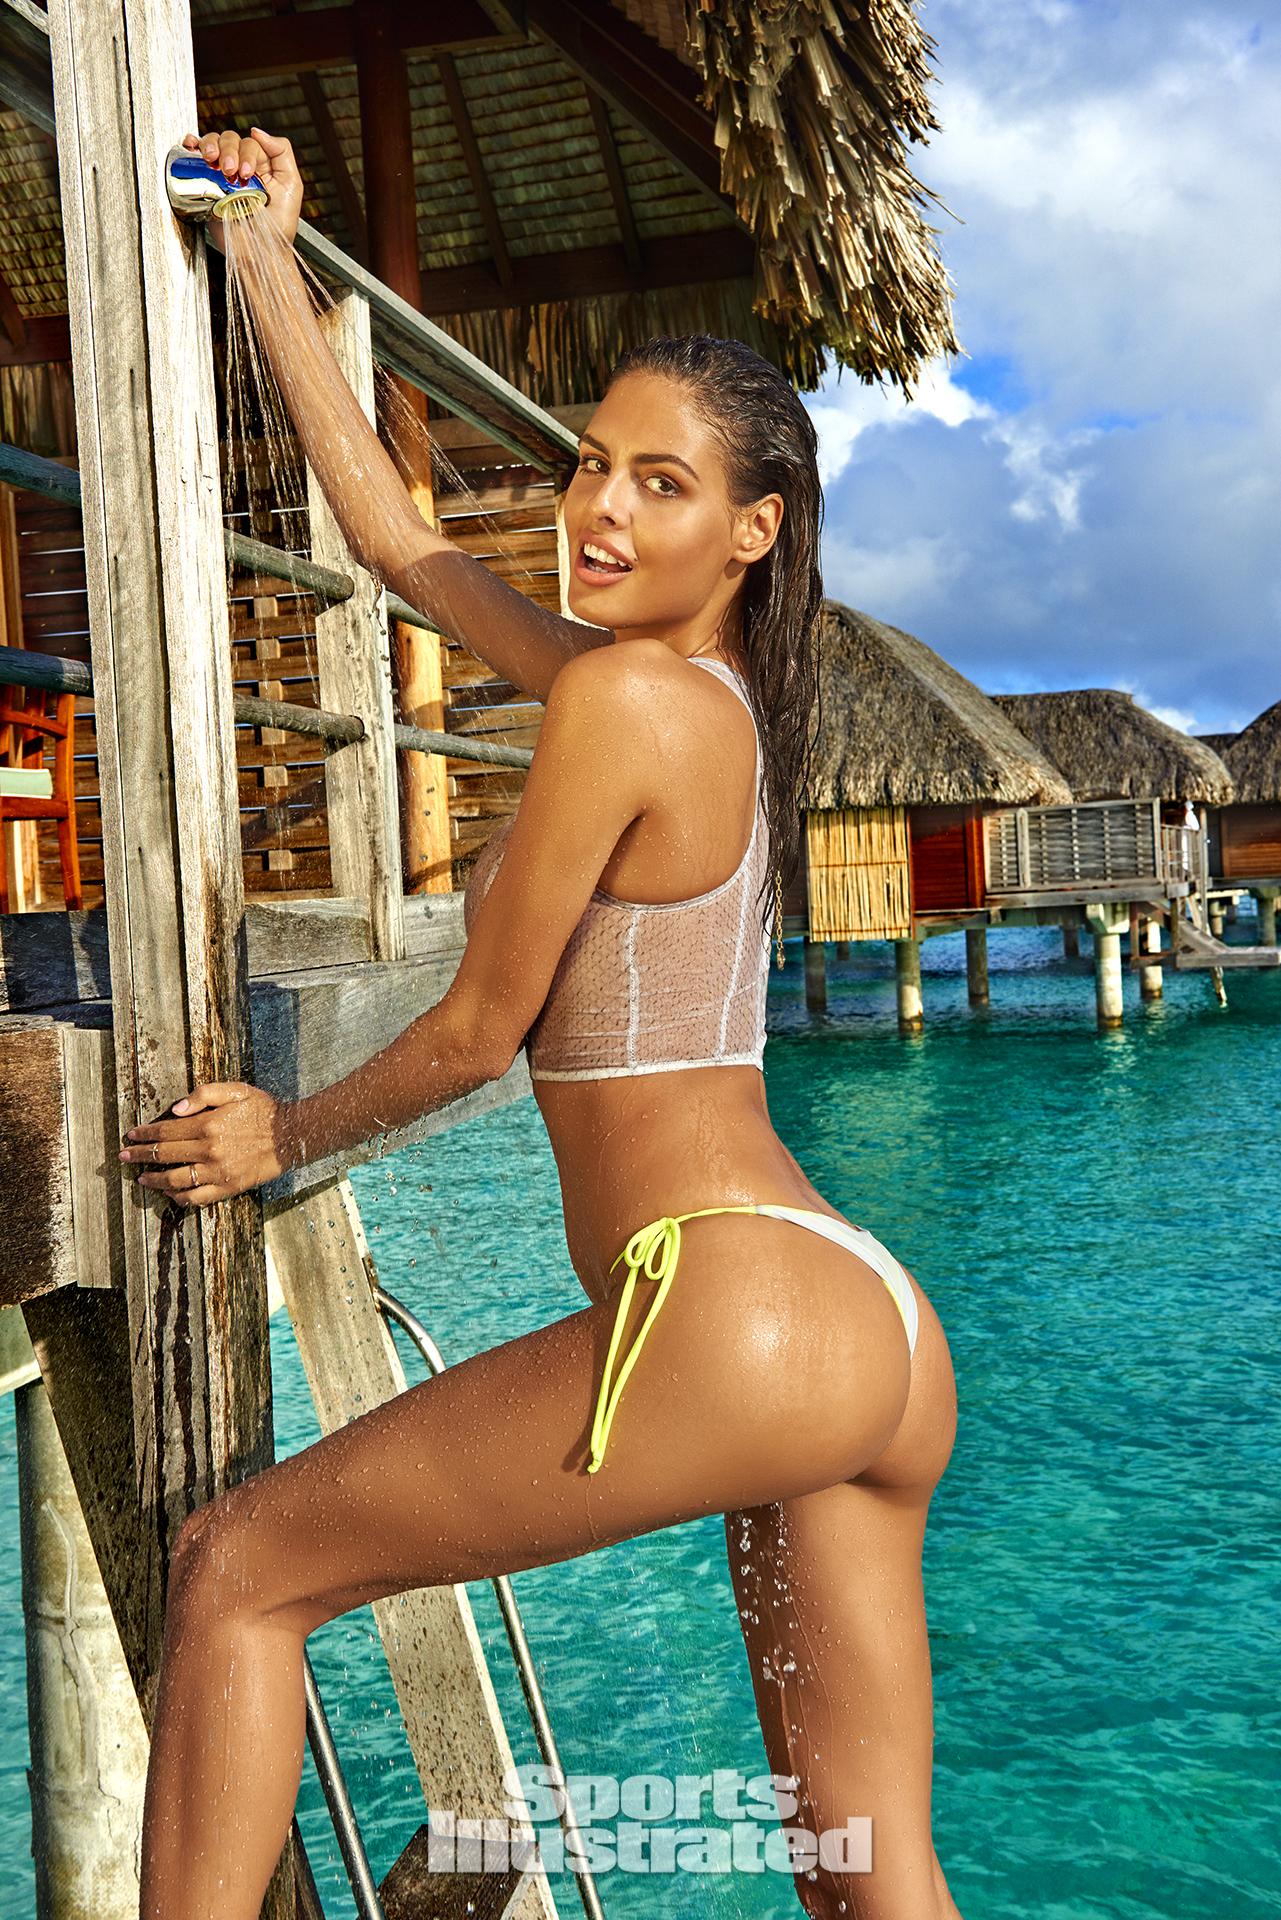 Bo Krsmanovic was photographed by Yu Tsai in the Islands of Tahiti. Top by eskini. Swimsuit by Kai Lani Swimwear.